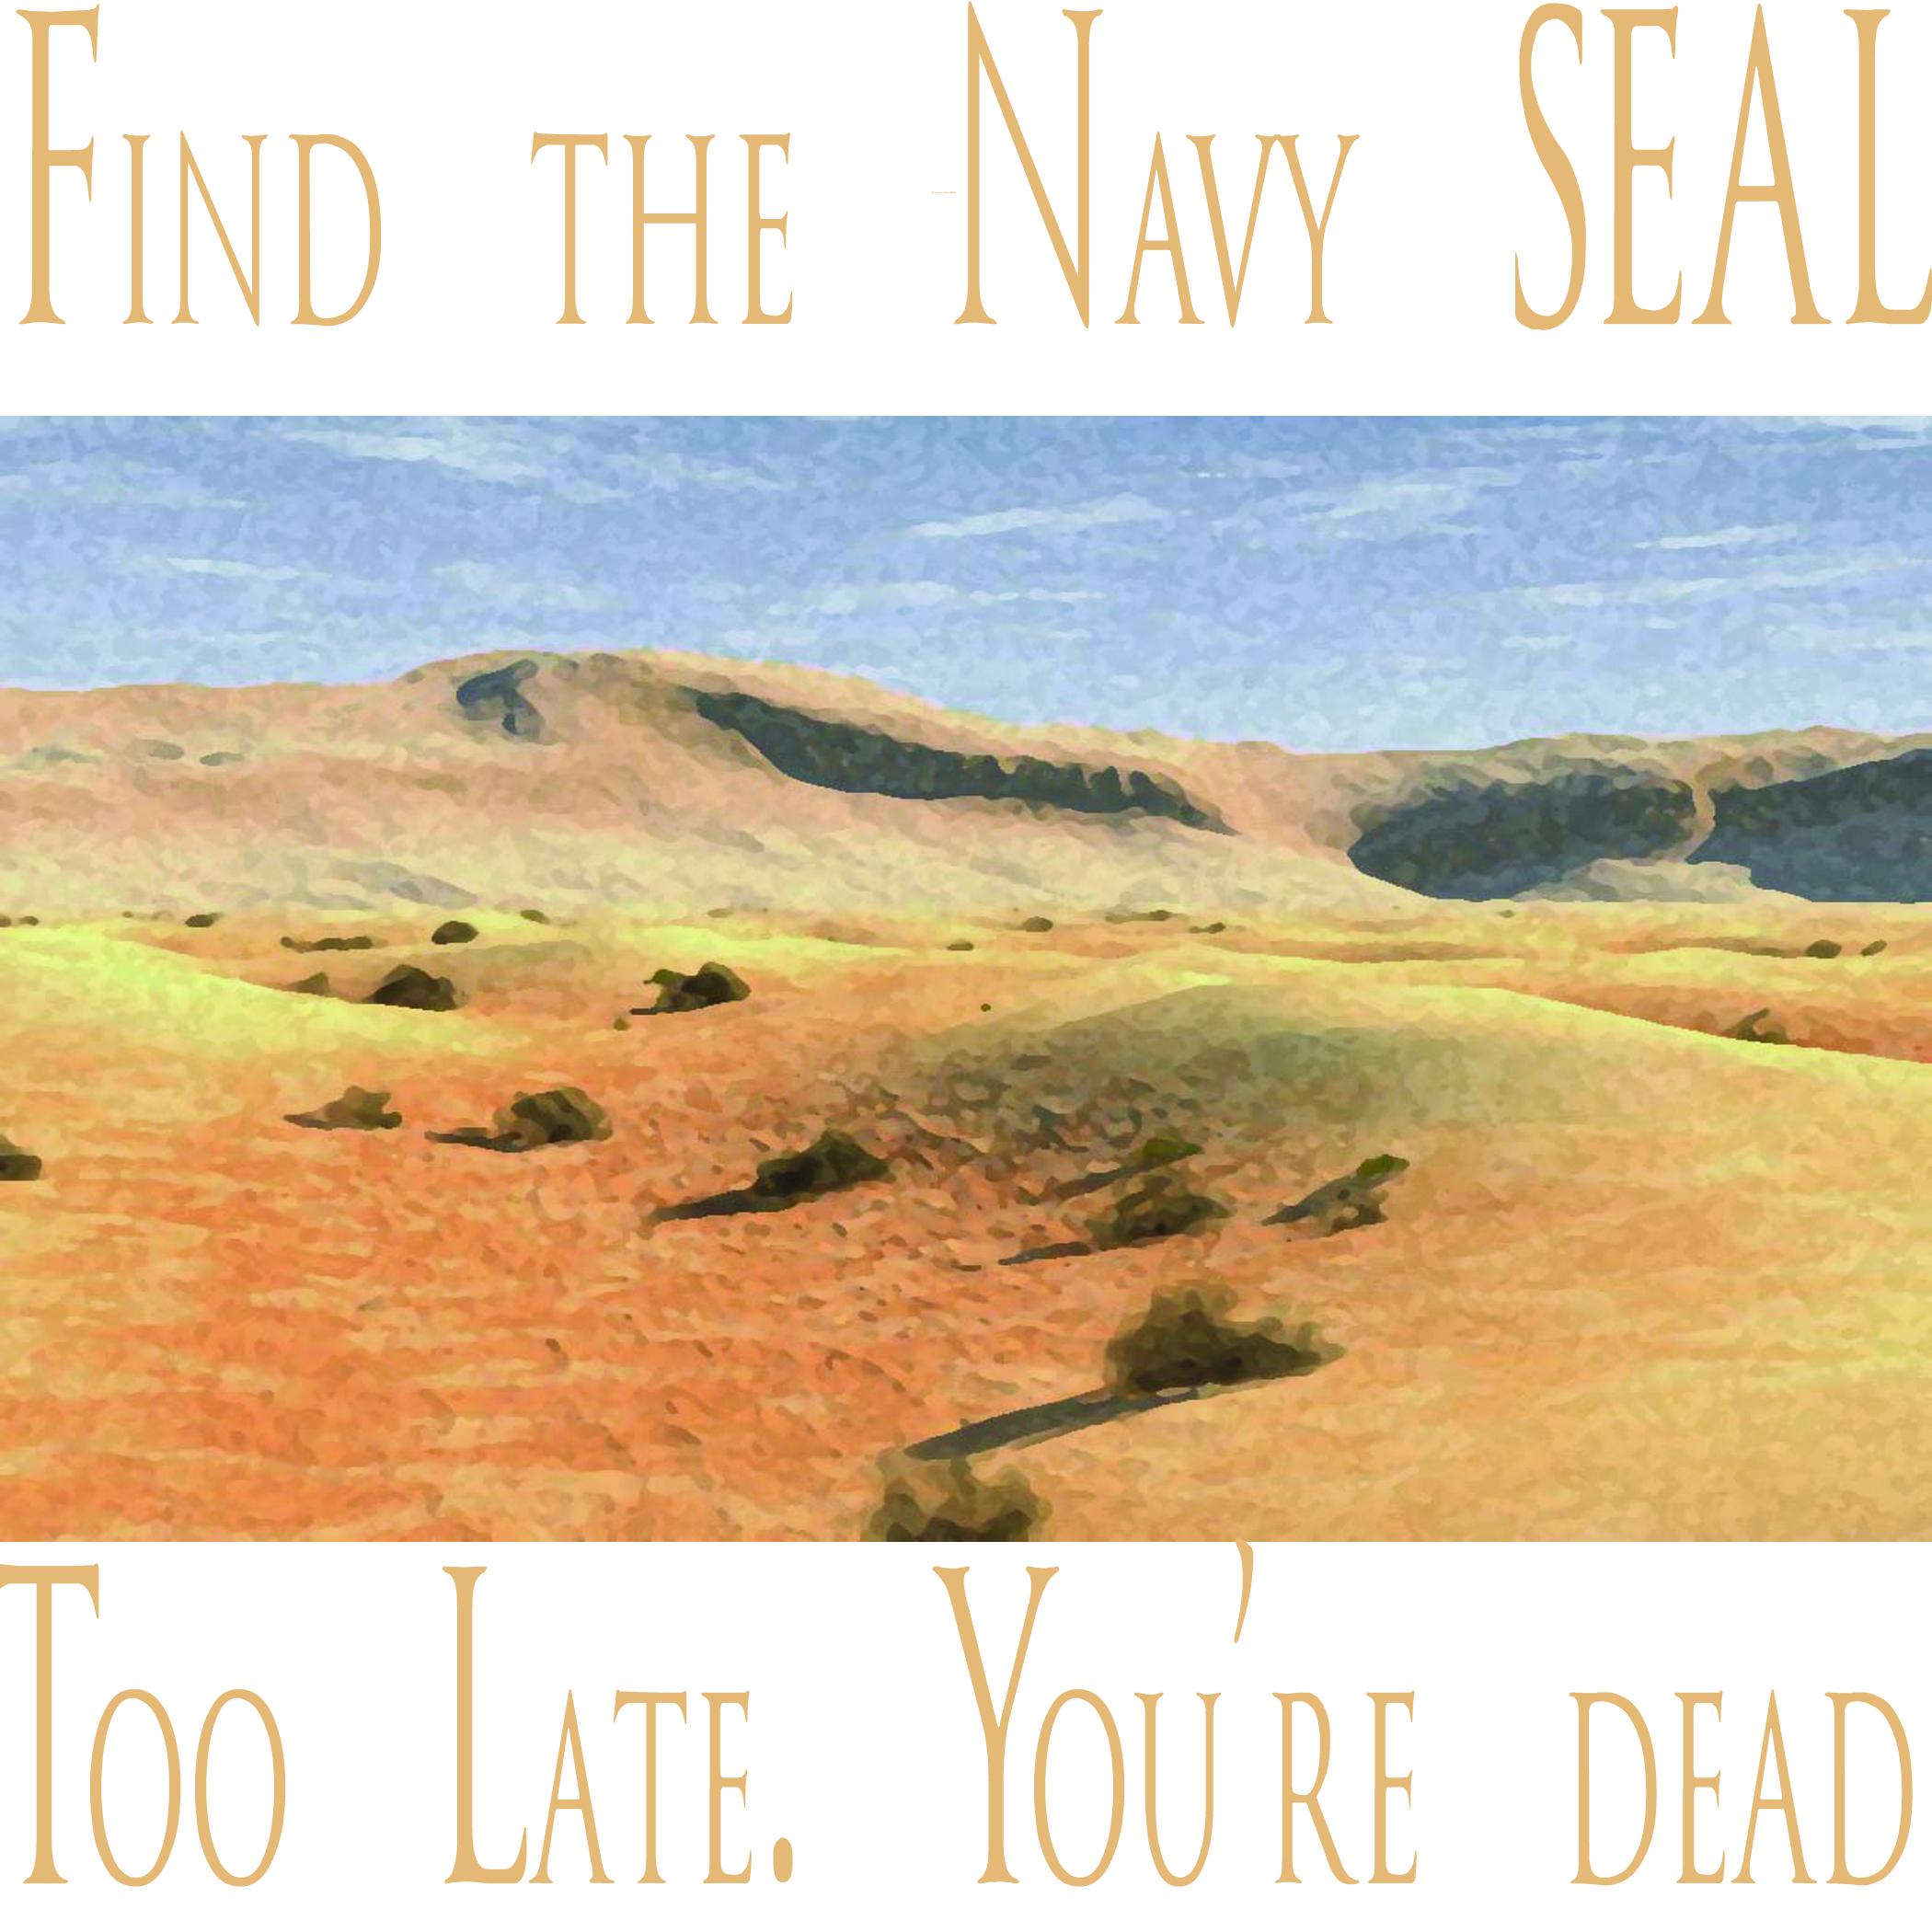 Where to meet navy seals